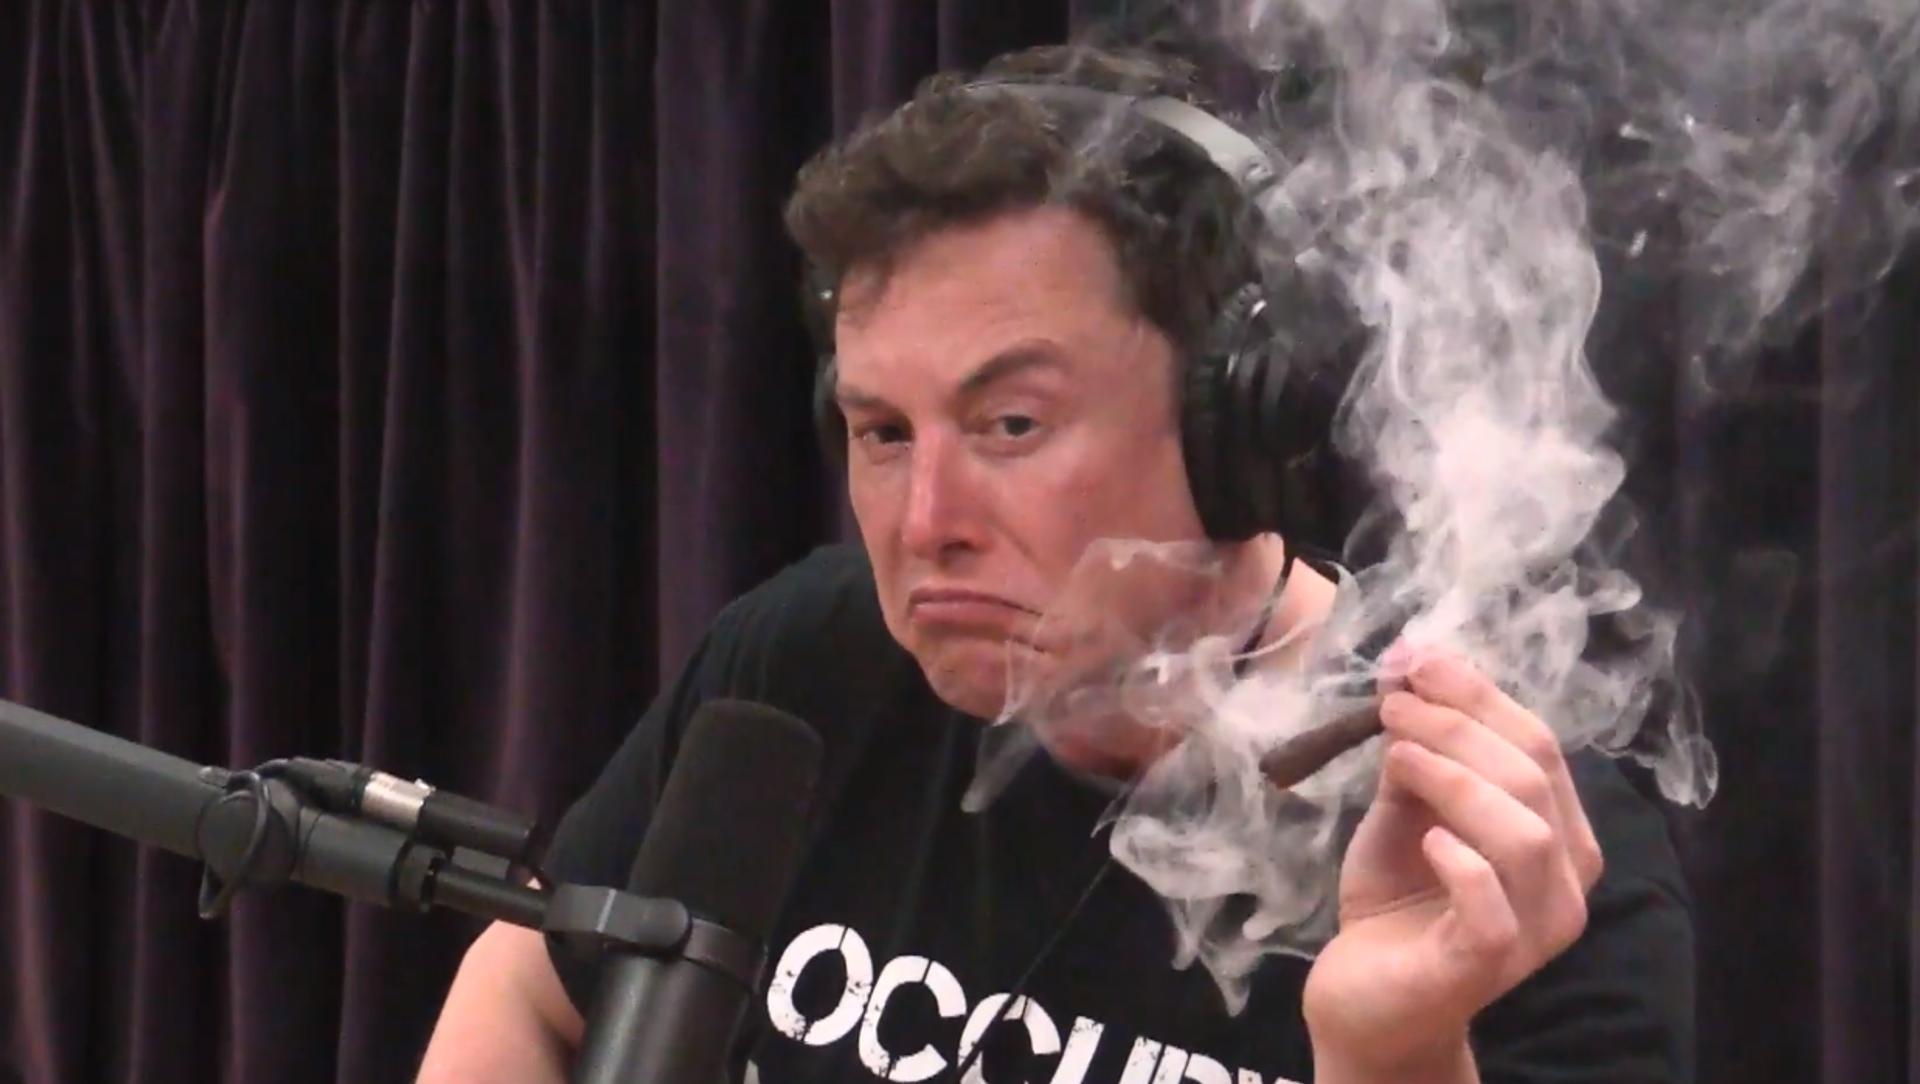 Elon Musk fuma marihuana - Sputnik Mundo, 1920, 16.11.2019